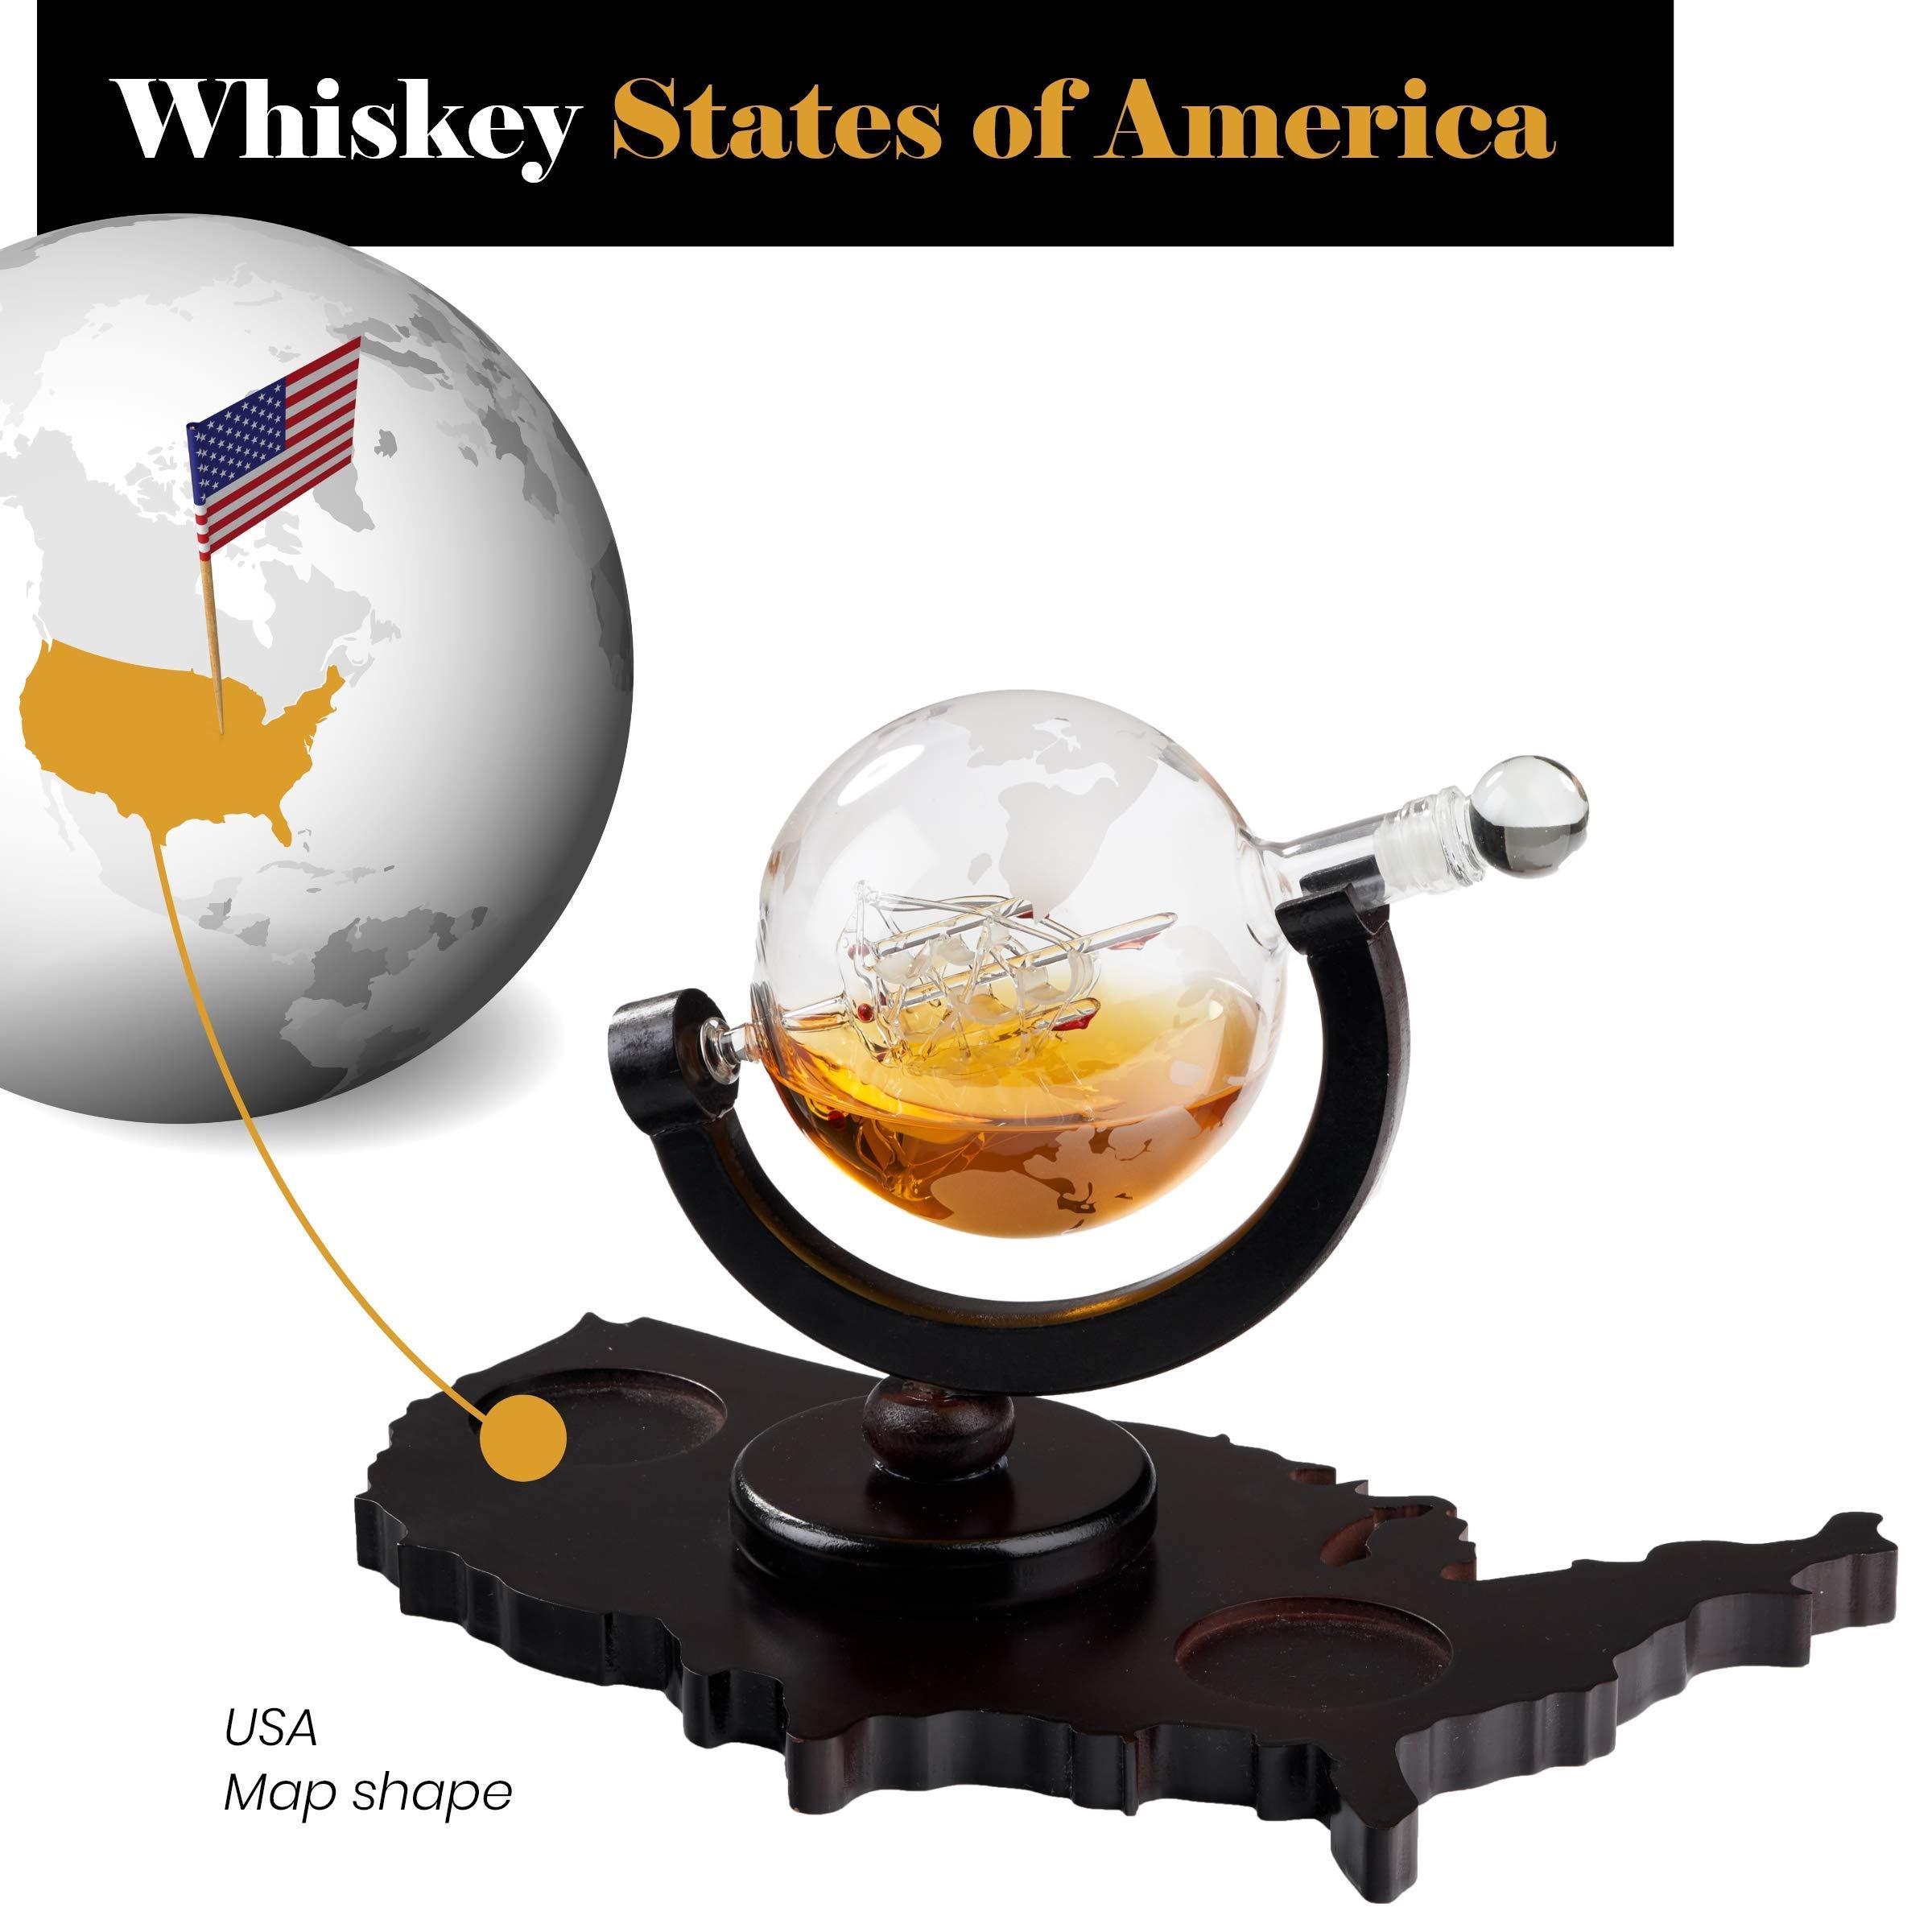 Whiskey Decanter Set World Etched Globe Decanter Airtight Stopper Antique Ship Liquor Dispenser Perfect Bar Gift Bourbon Scotch Vodka Liquor USA Map Tray 850 ml by Bezrat (Image #6)